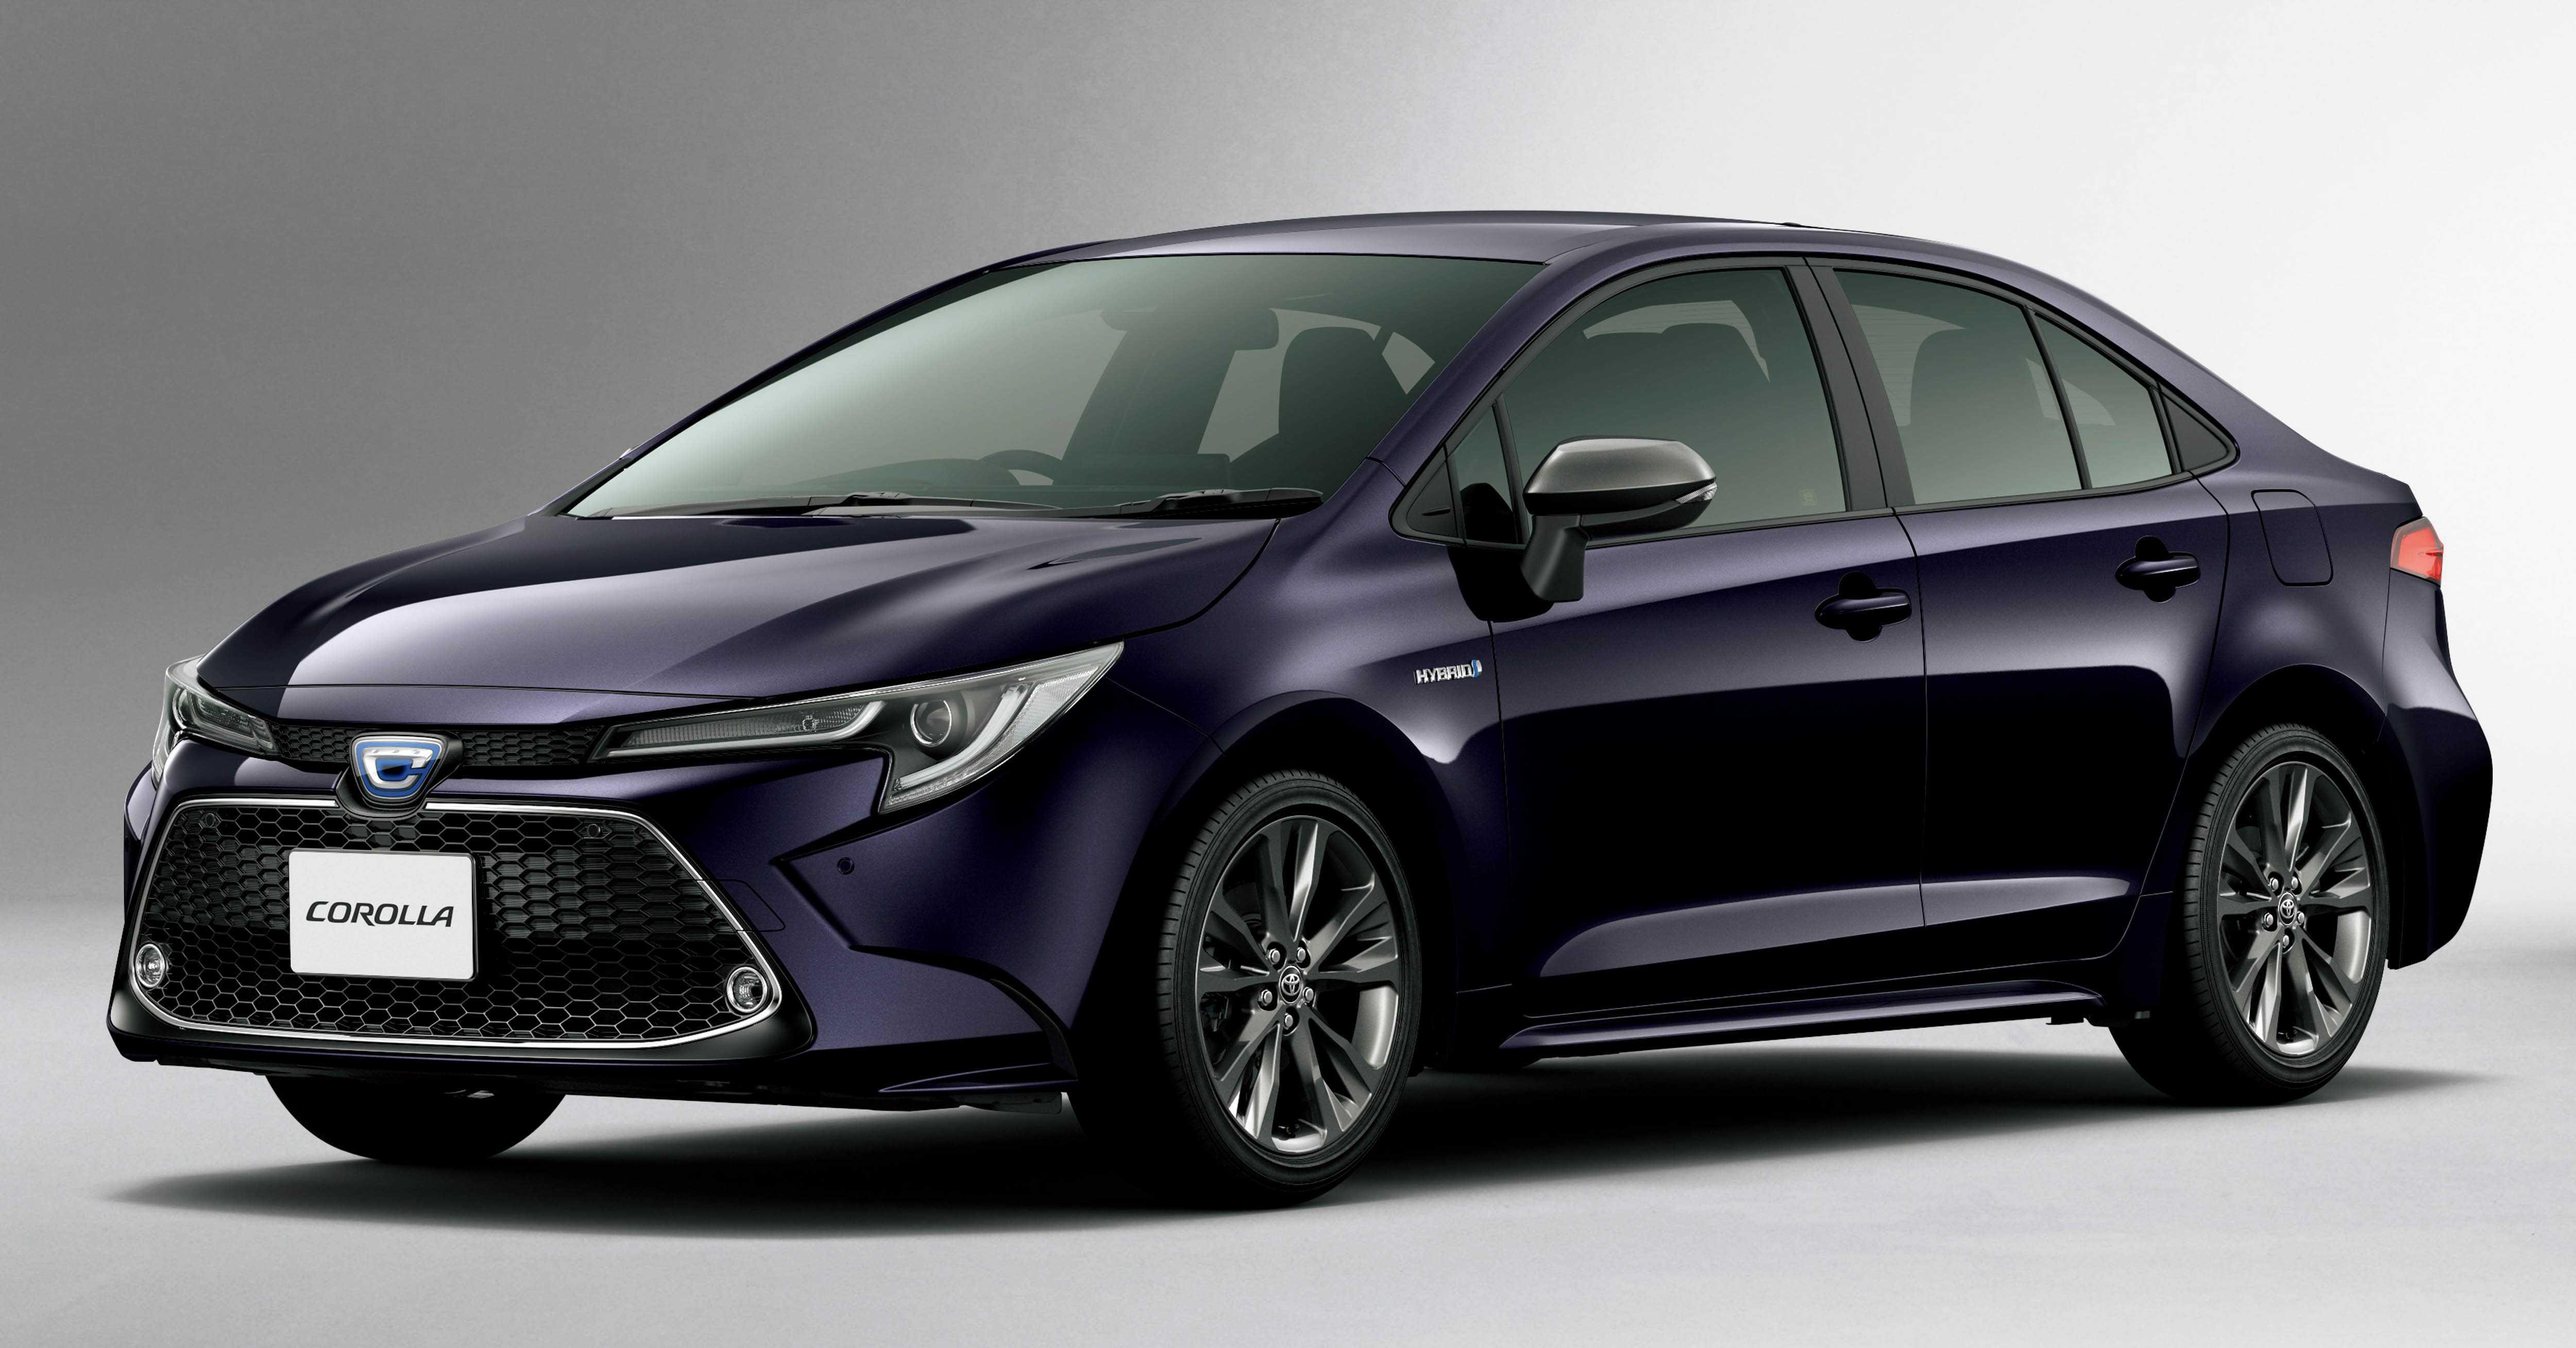 Toyota corolla 2019 года | фото, характеристики, цена новой модели